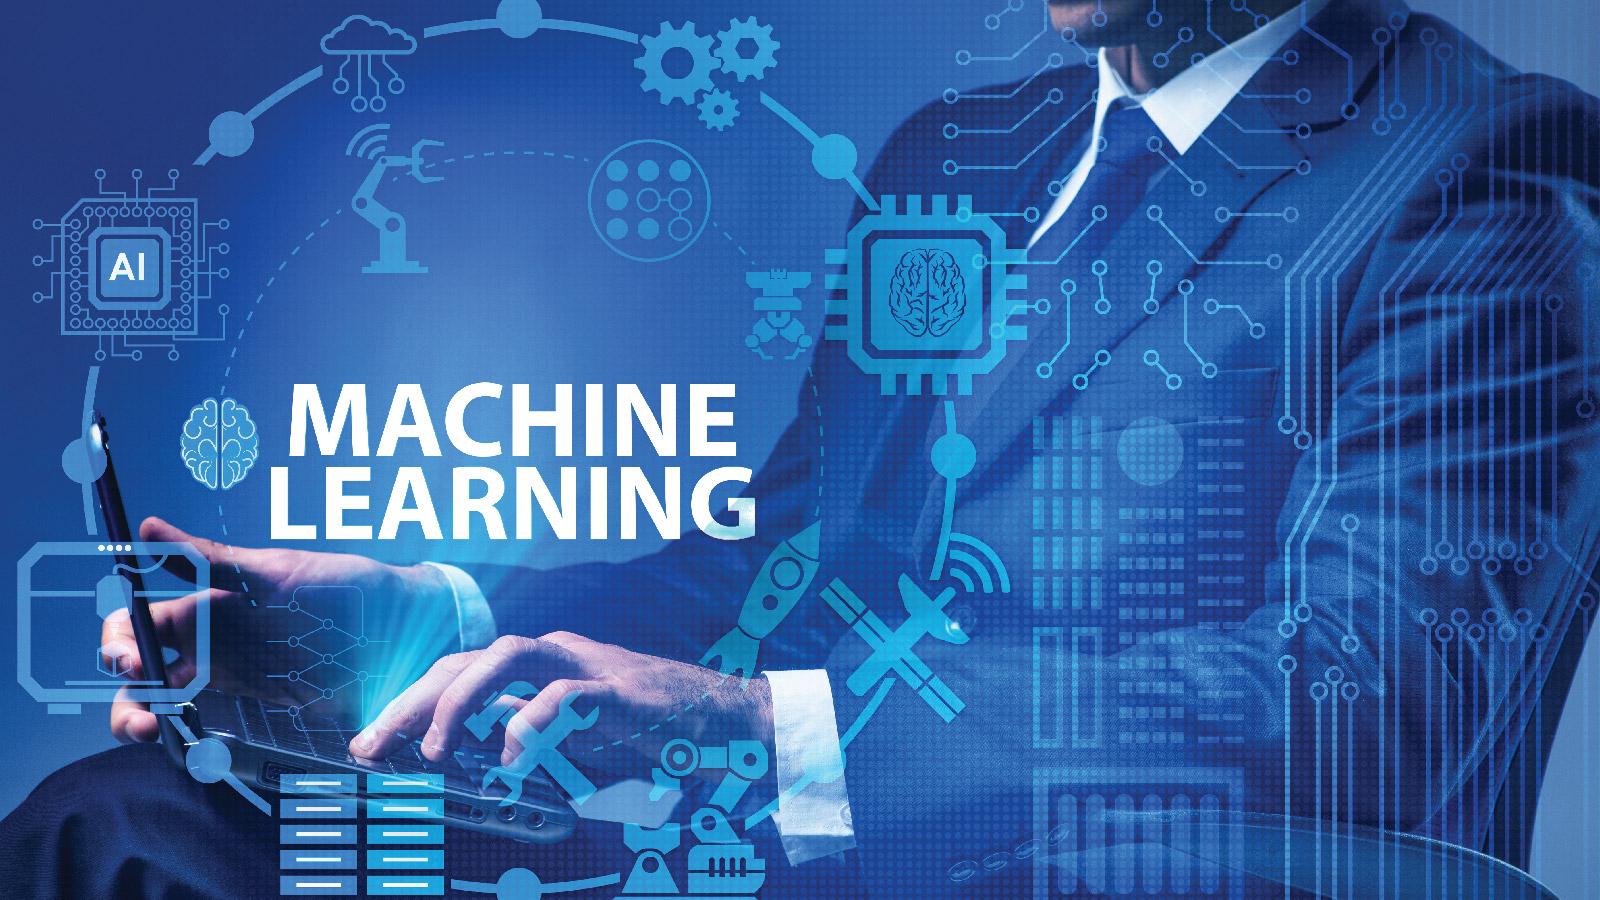 ML, data scientists, data science, deployment, optimization, business, customer experience, customer insights, enterprise